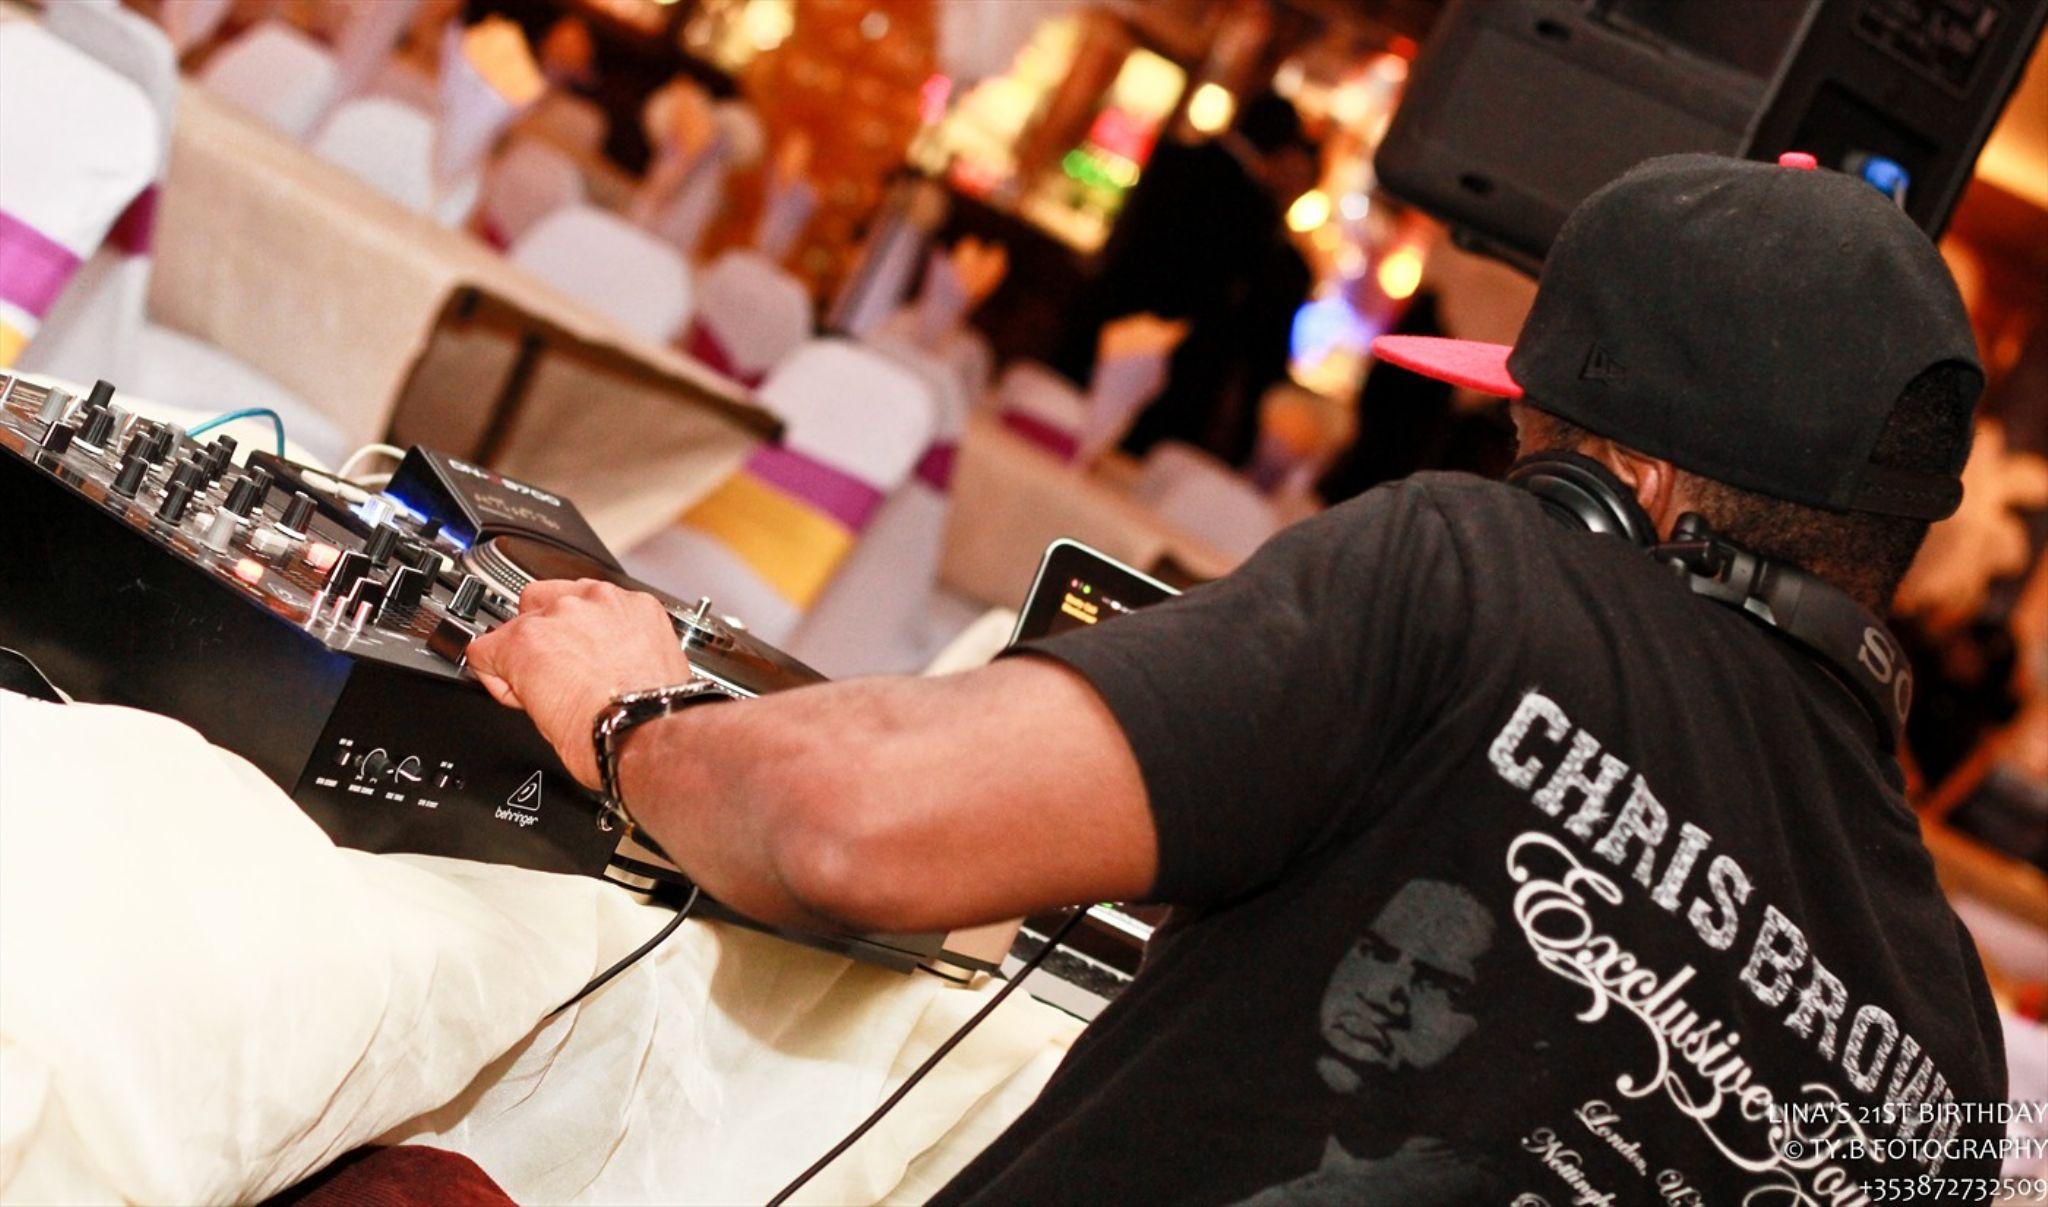 DJ by TyBellosFotography